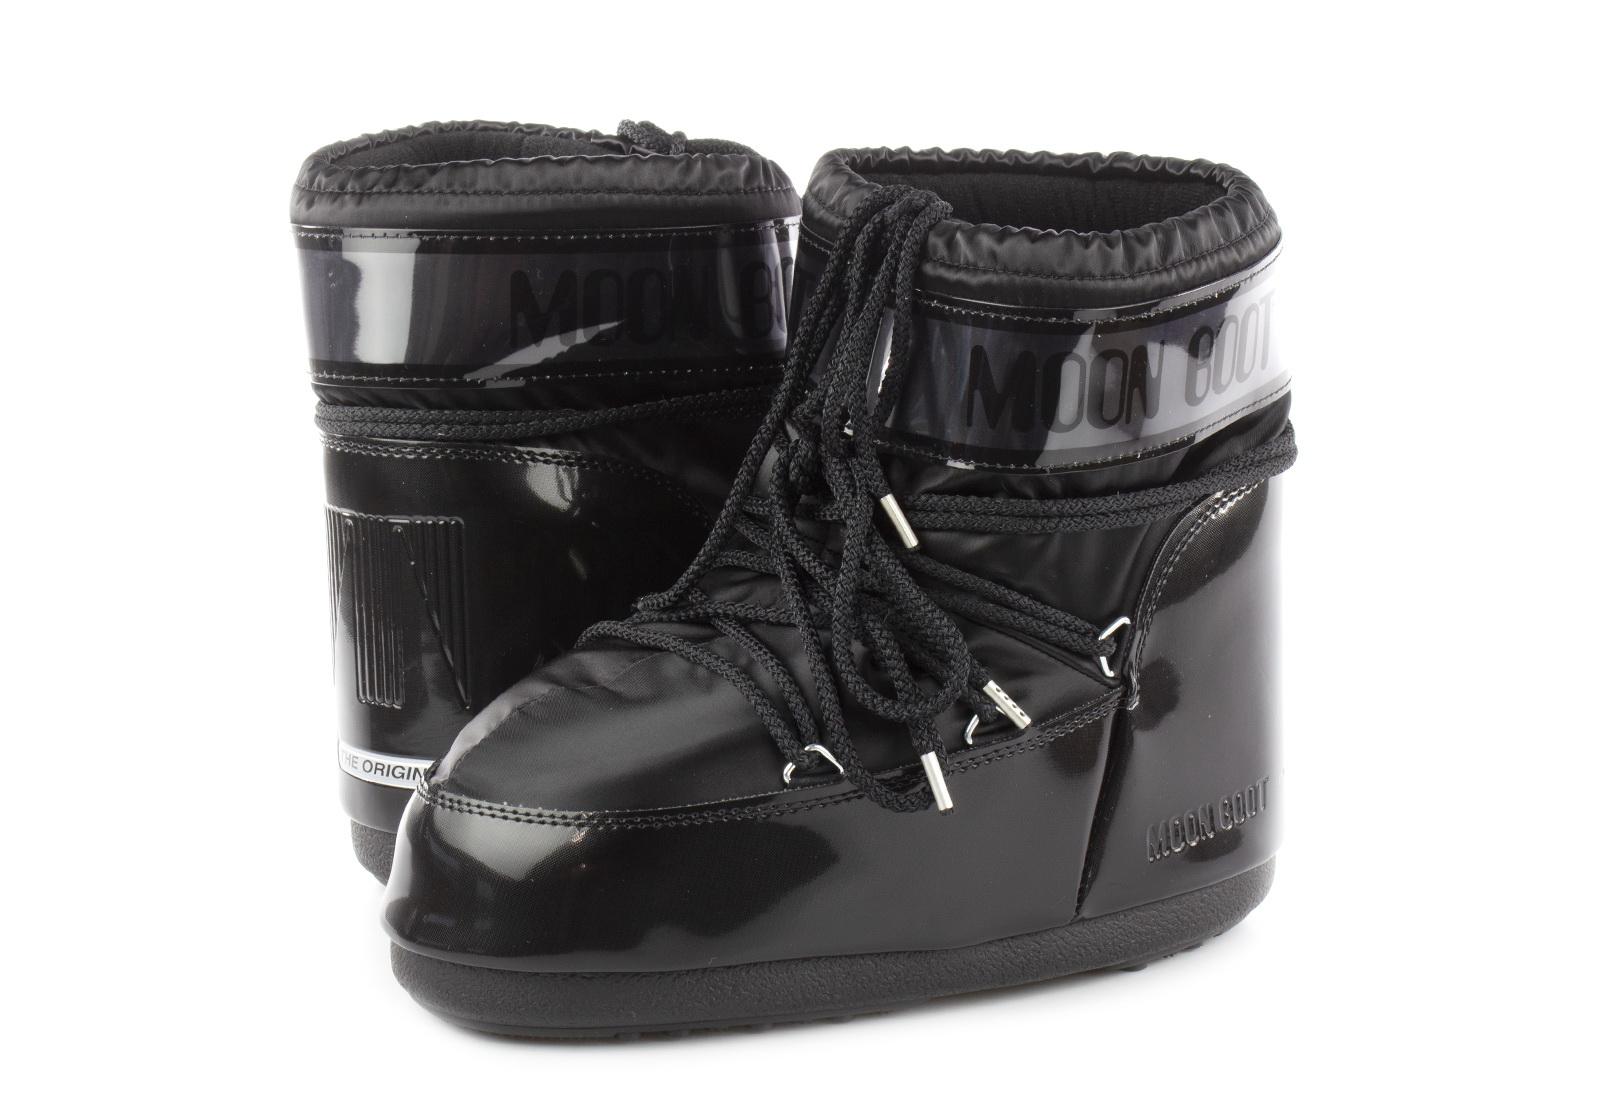 Moon Boot Vysoké Topánky, Čižmy Moon Boot Classic Low Glance